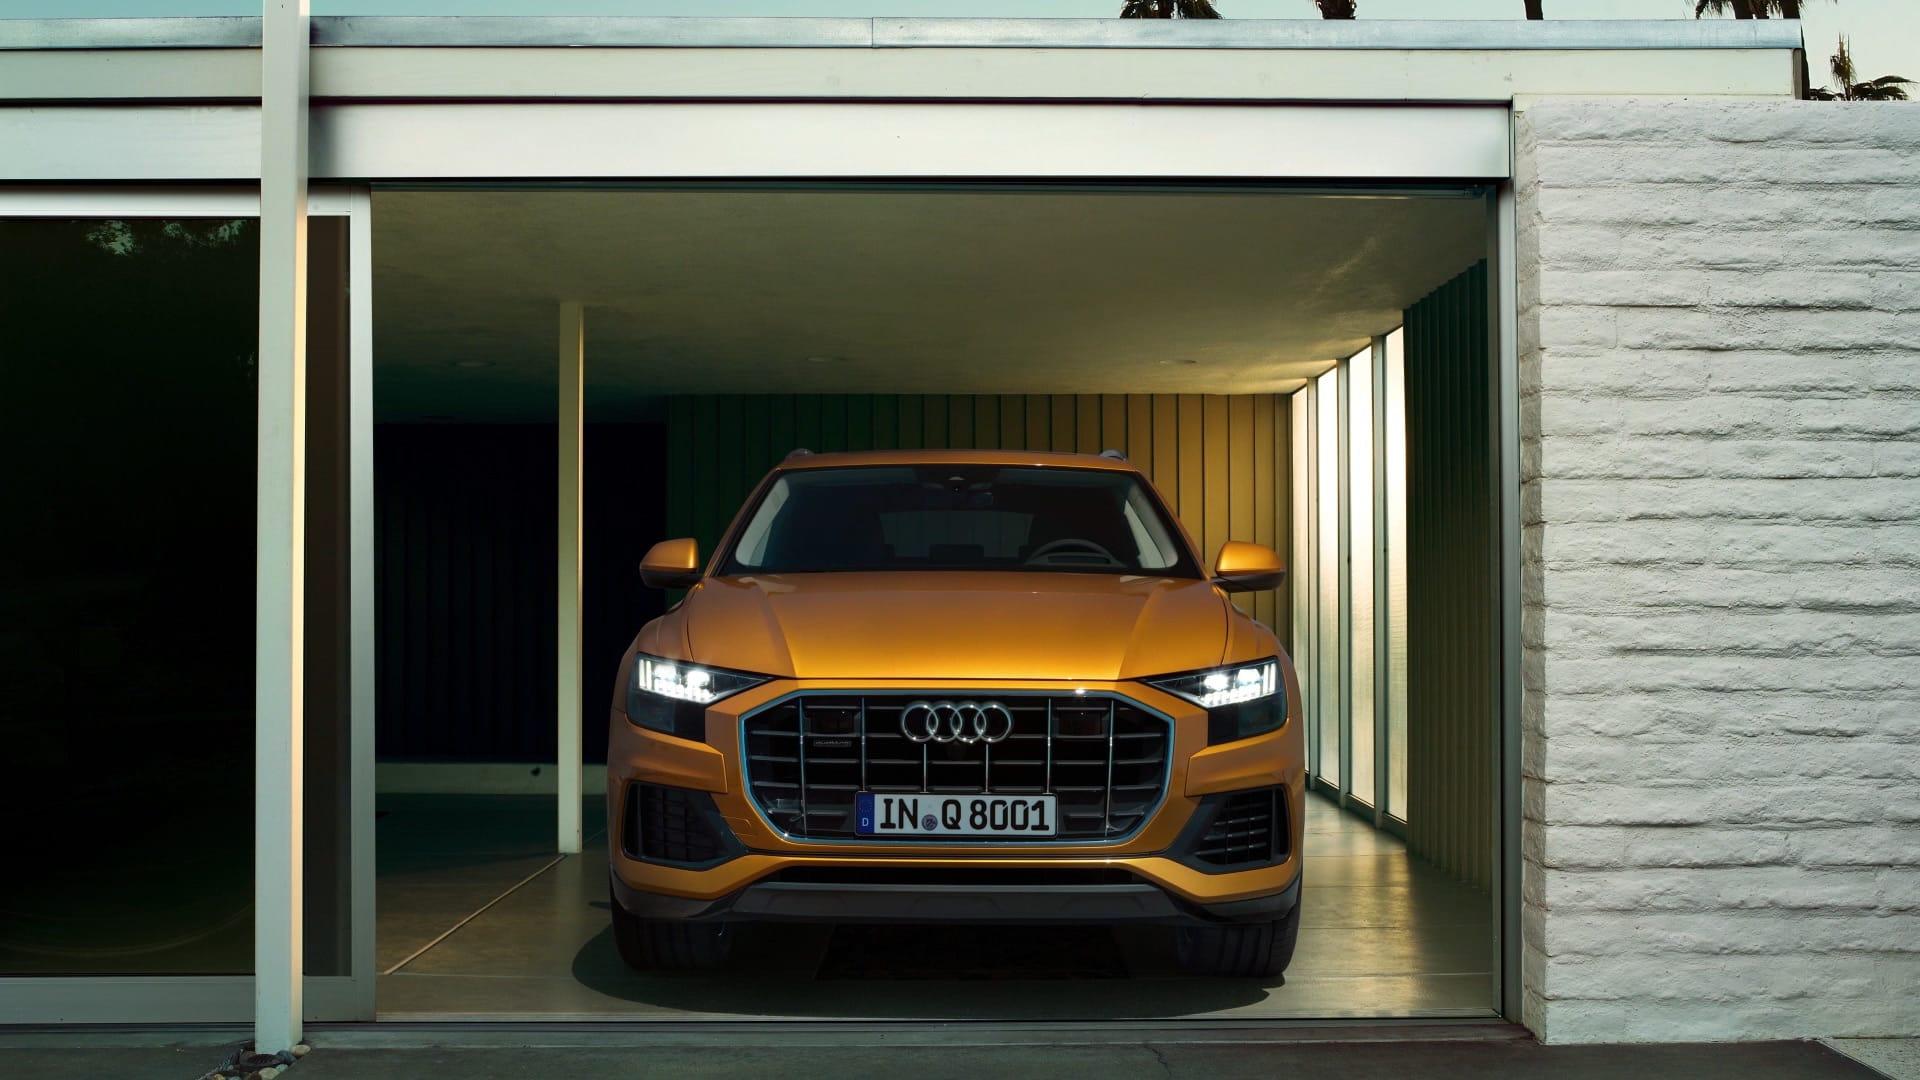 Audi Q8 2019 > Audi Q8 2019 > Audi Dubai